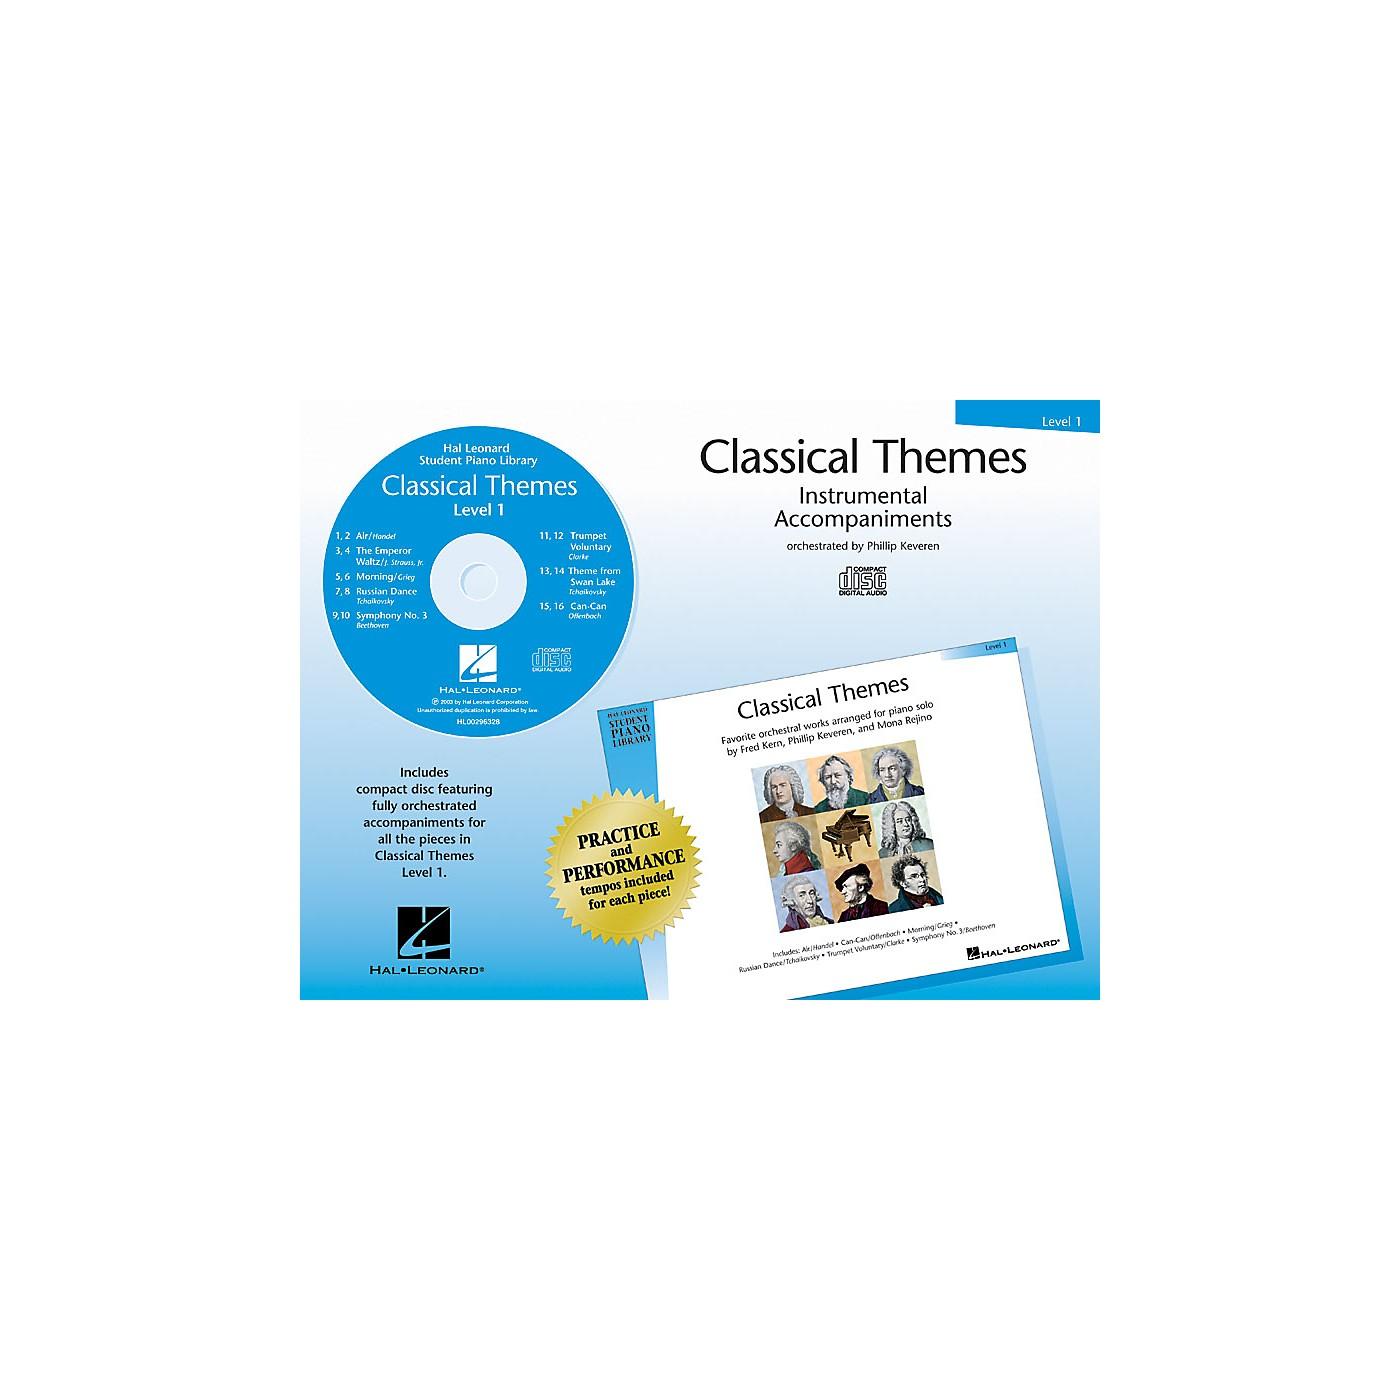 Hal Leonard Classical Themes - Level 1 (Hal Leonard Student Piano Library) Piano Library Series CD thumbnail